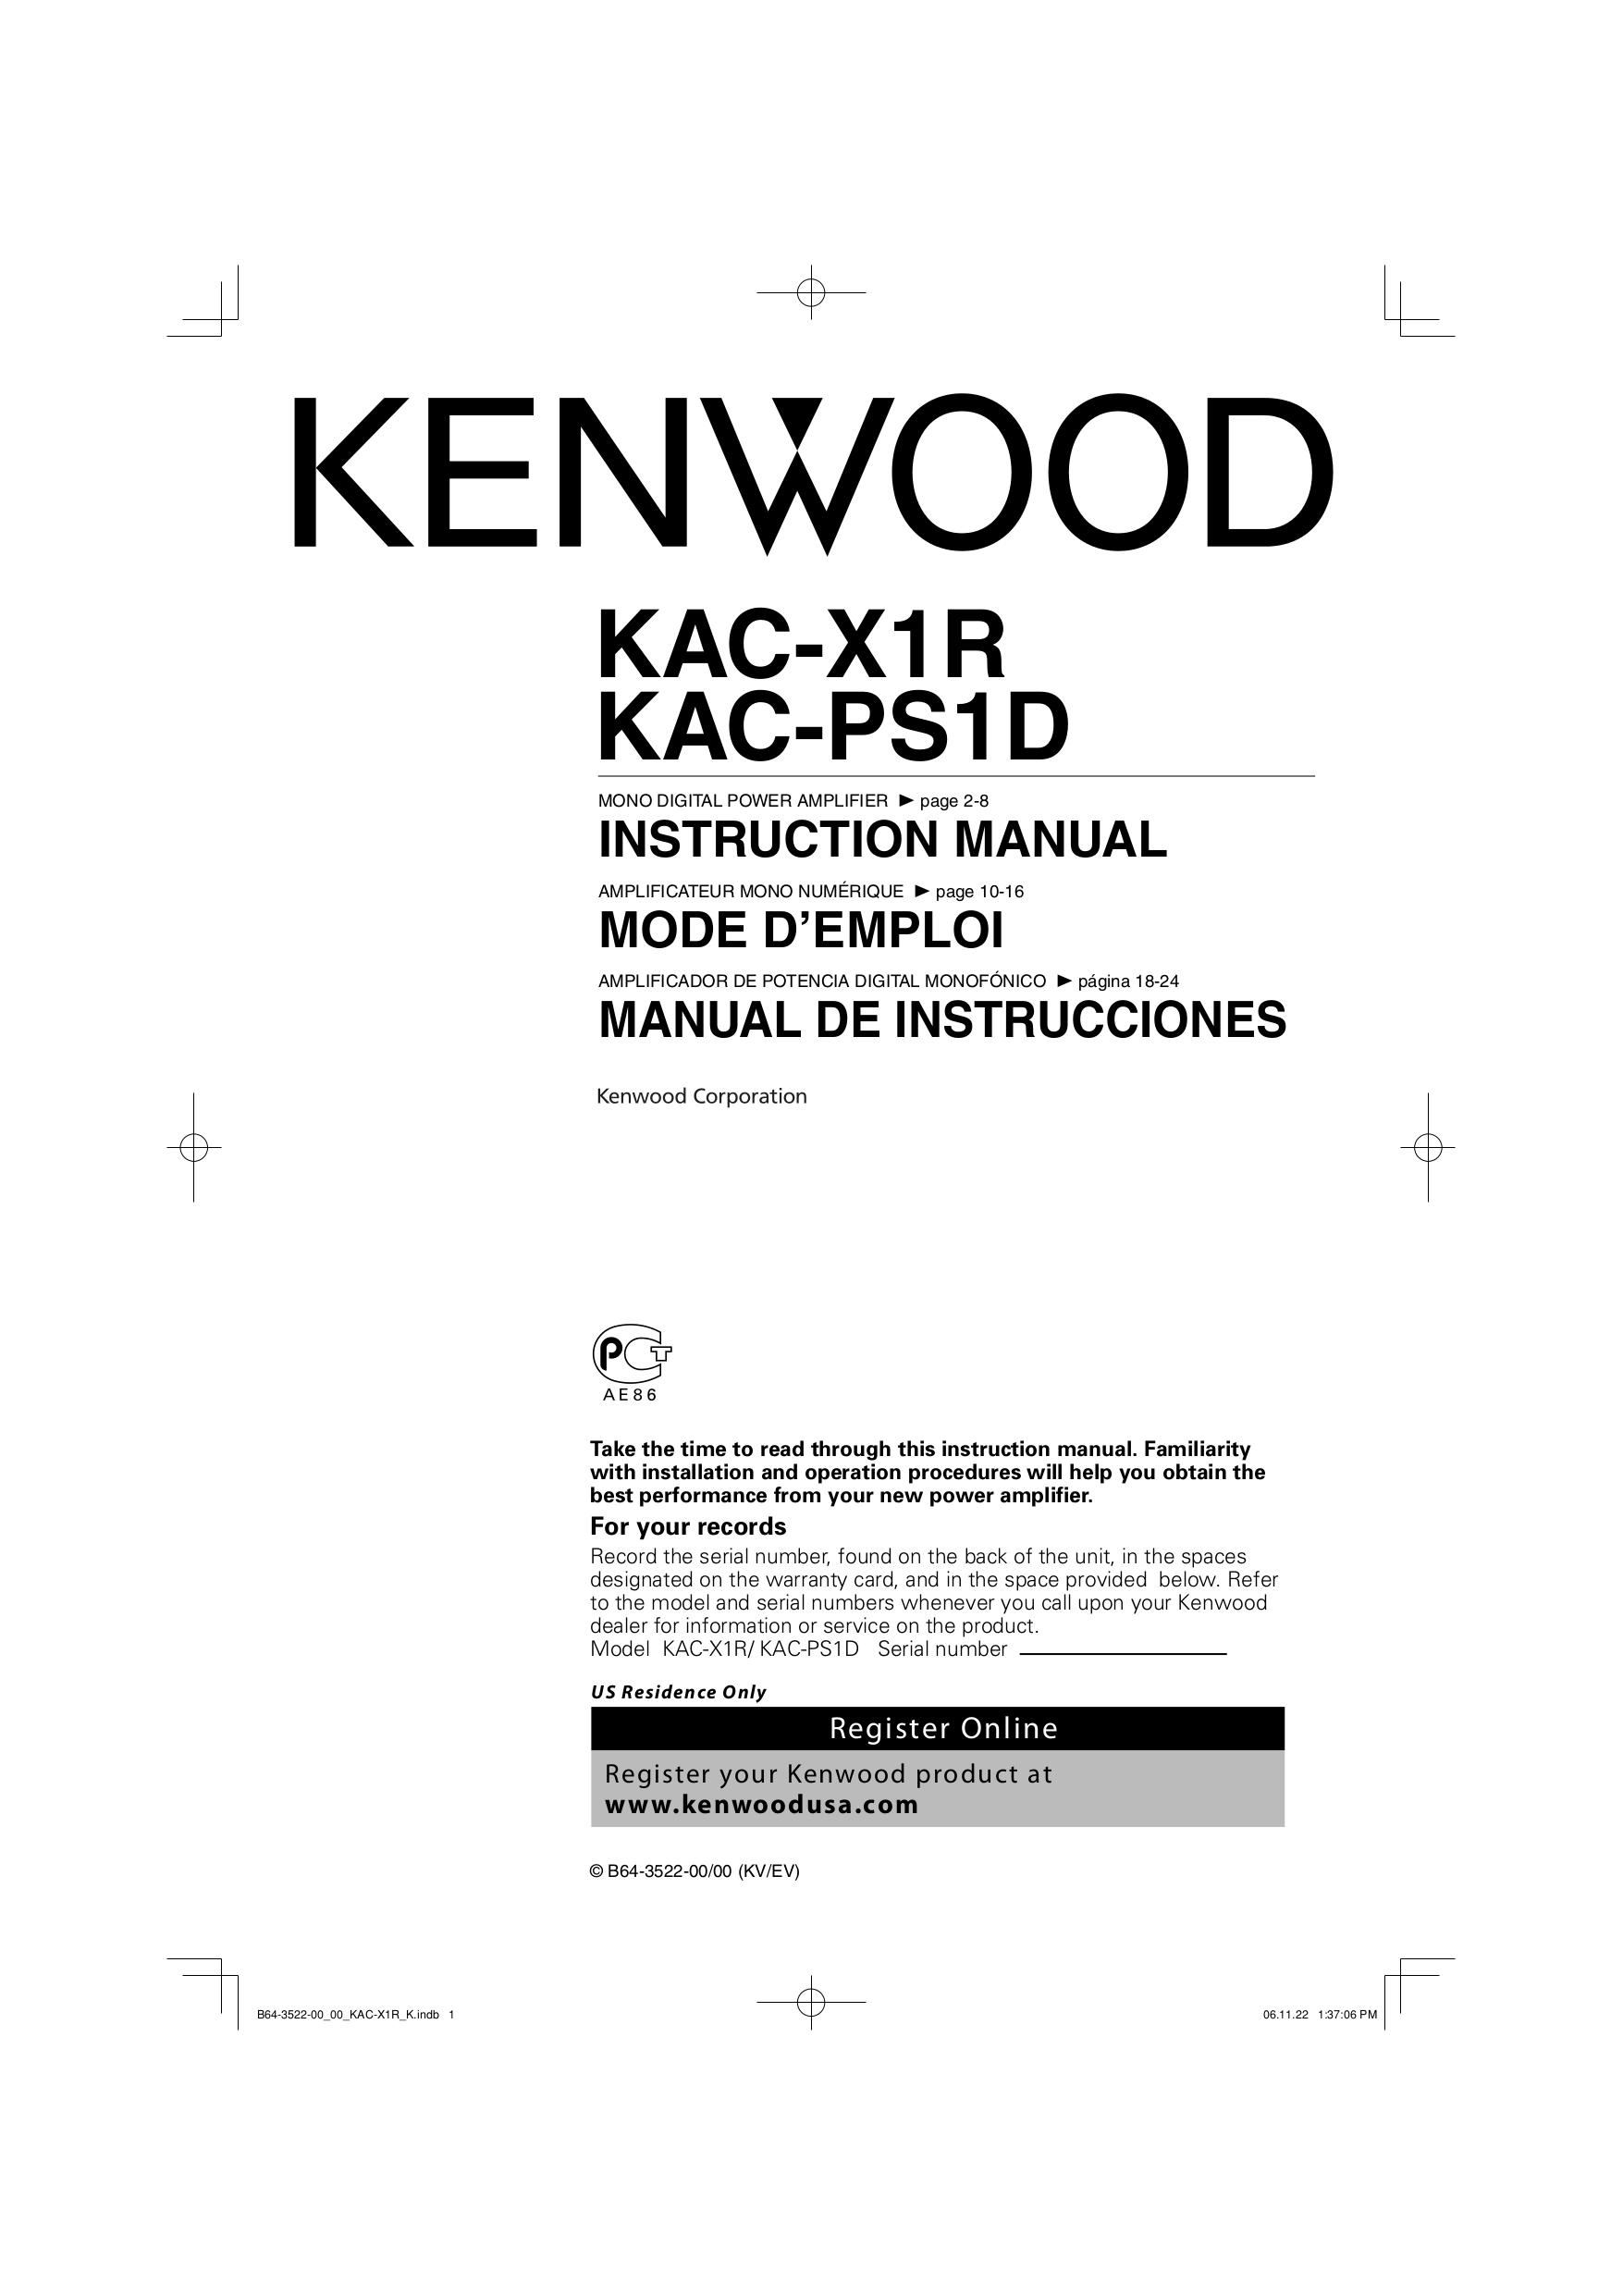 Diagram Wiring Diagram Kenwood Kdc 7070r Full Version Hd Quality Kdc 7070r Trackdiagrams Agorasup Fr